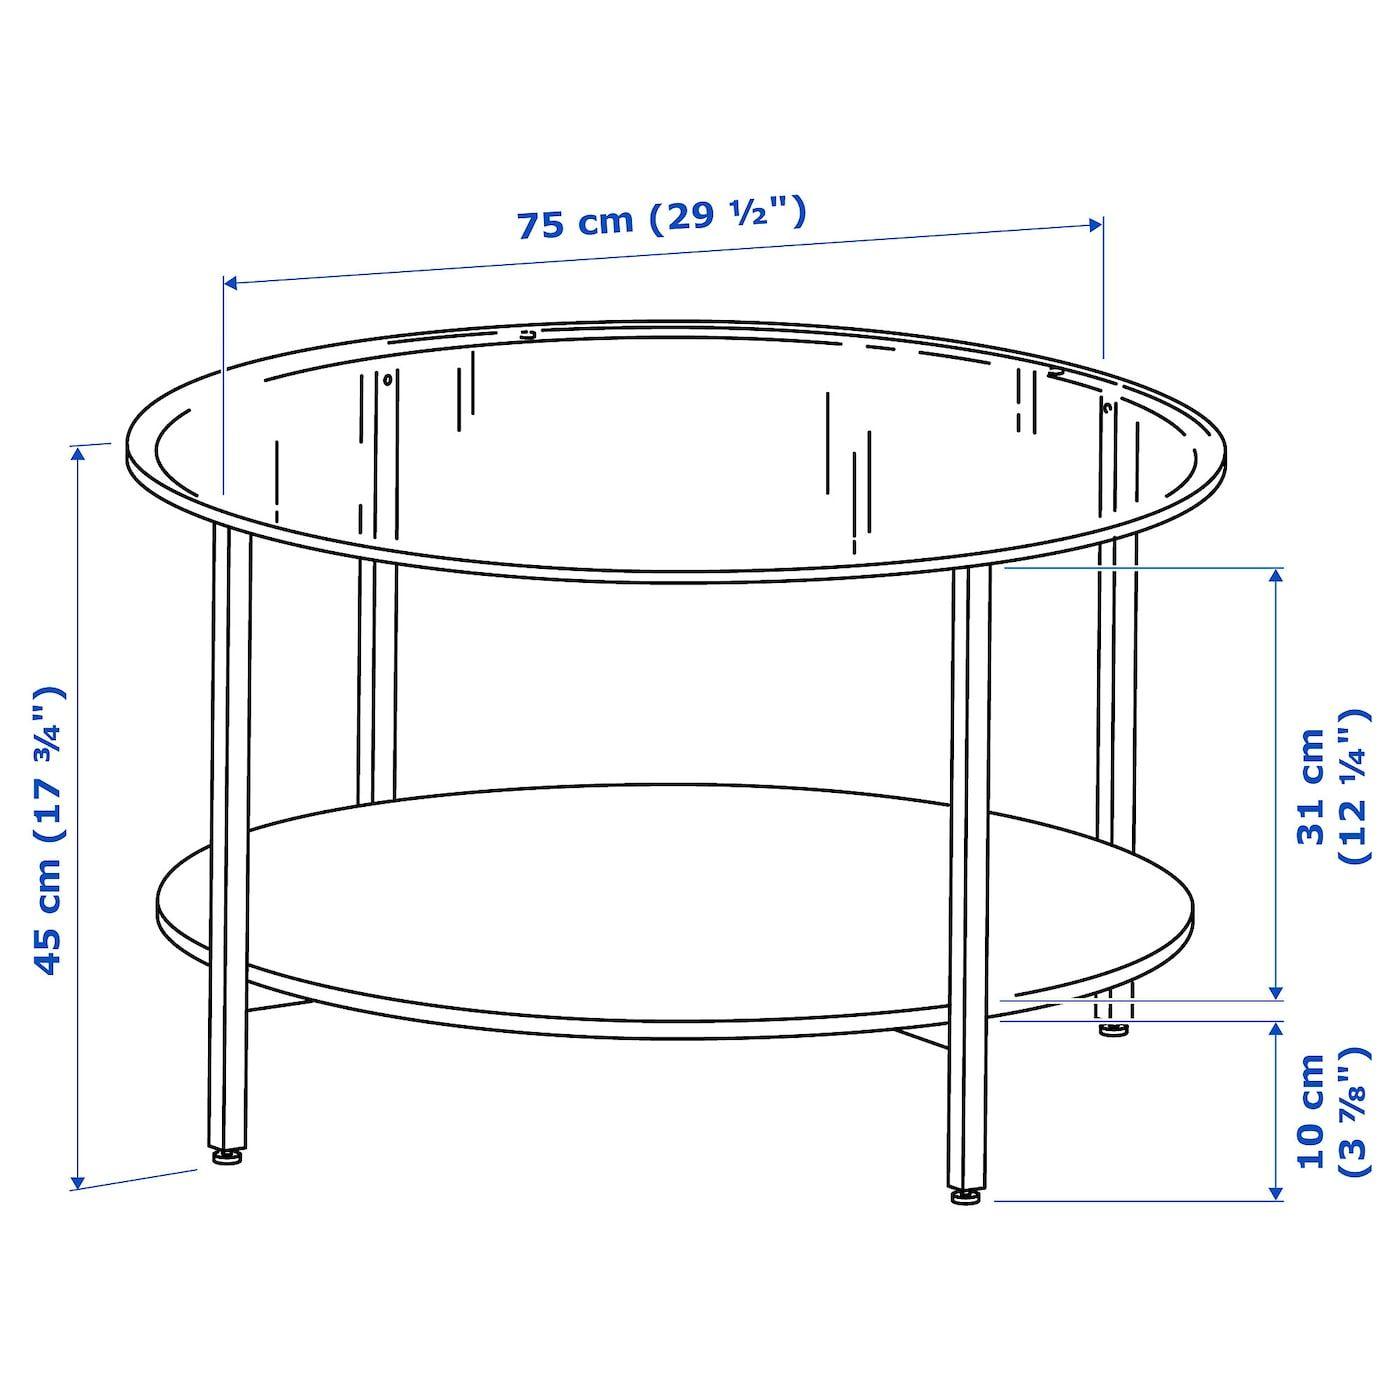 Vittsjo Coffee Table Black Brown Glass 291 2 75 Cm Ikea Coffee Table Ikea Glass Coffee Table [ 1400 x 1400 Pixel ]